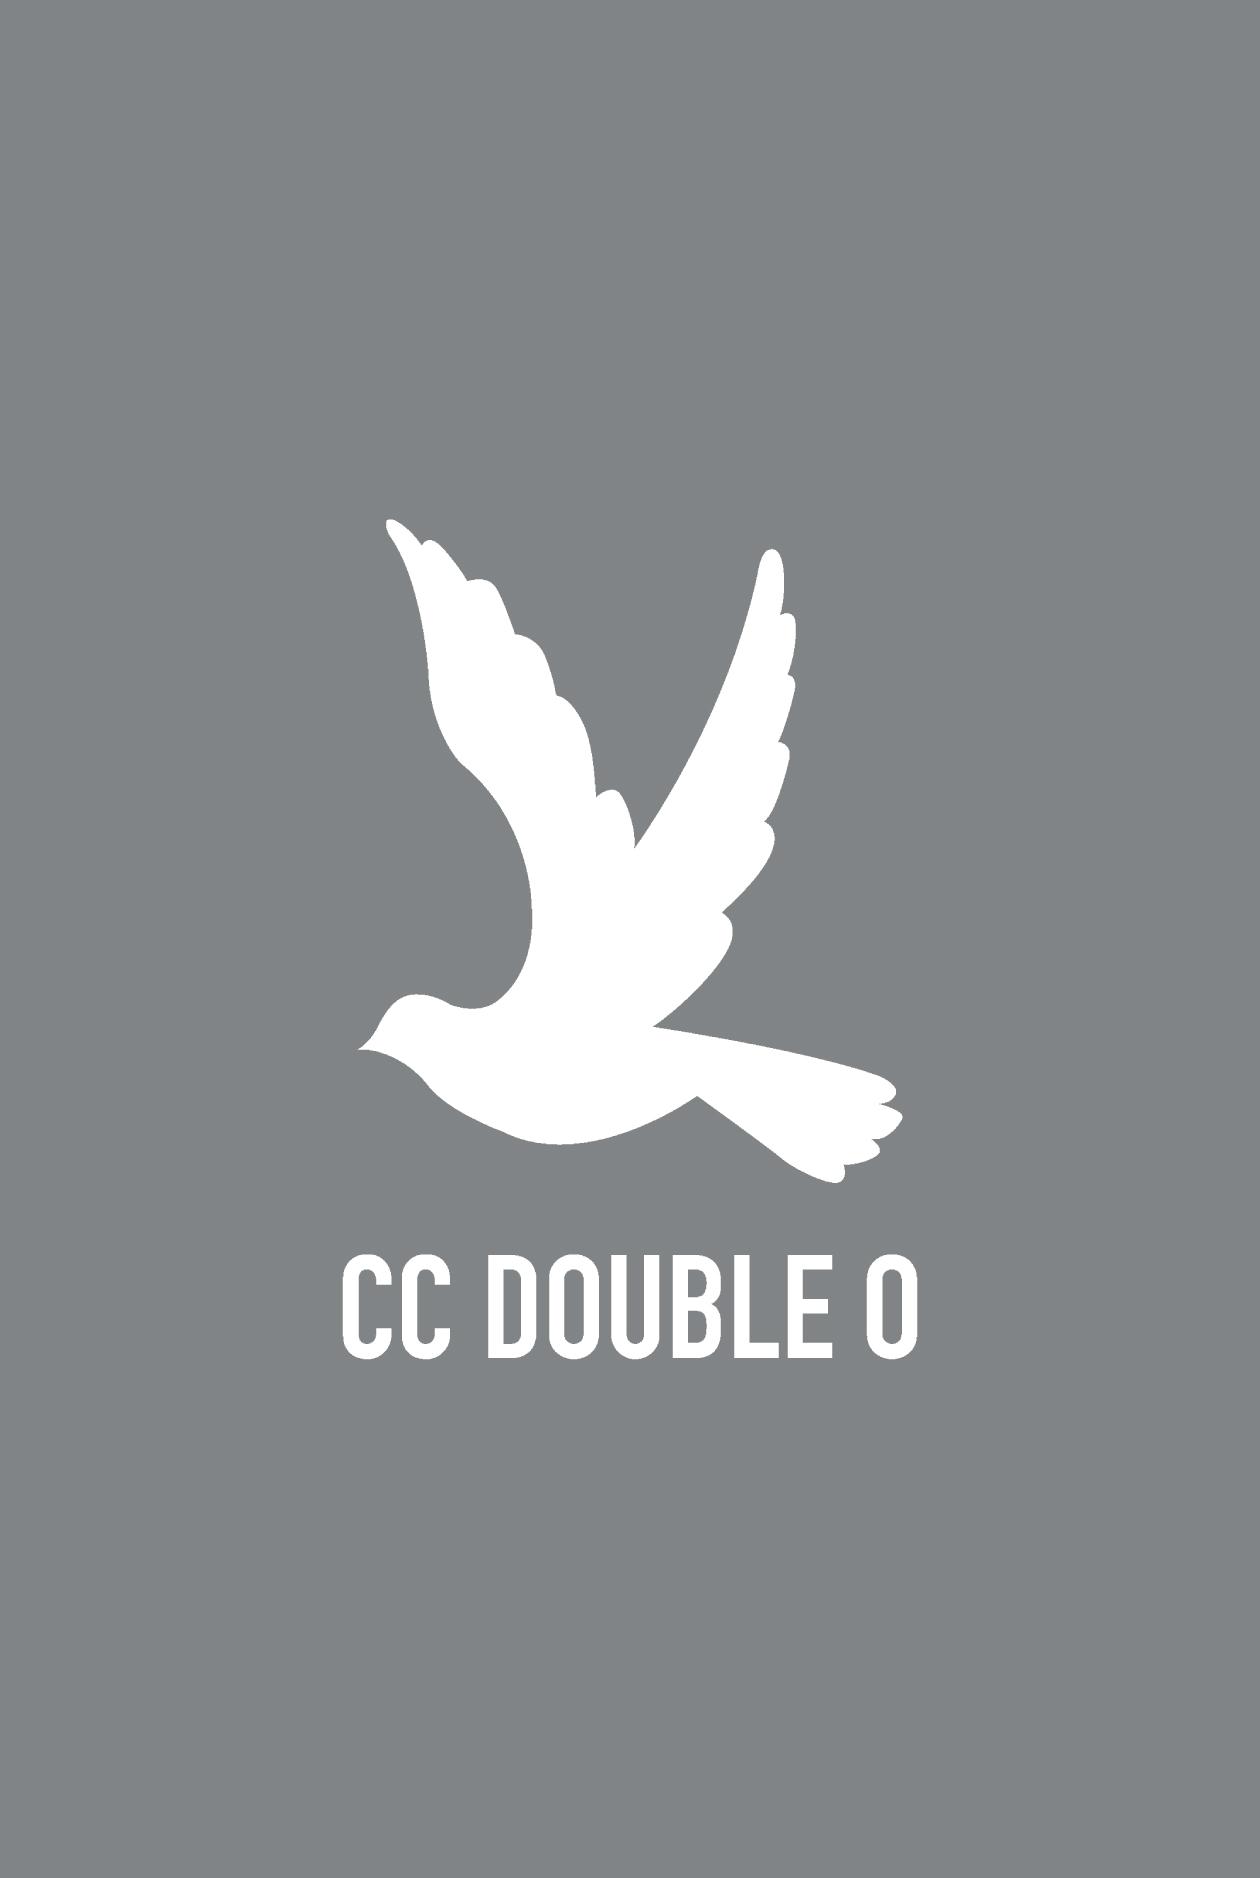 CC DOUBLE O Wrap-Around Leather Bracelet